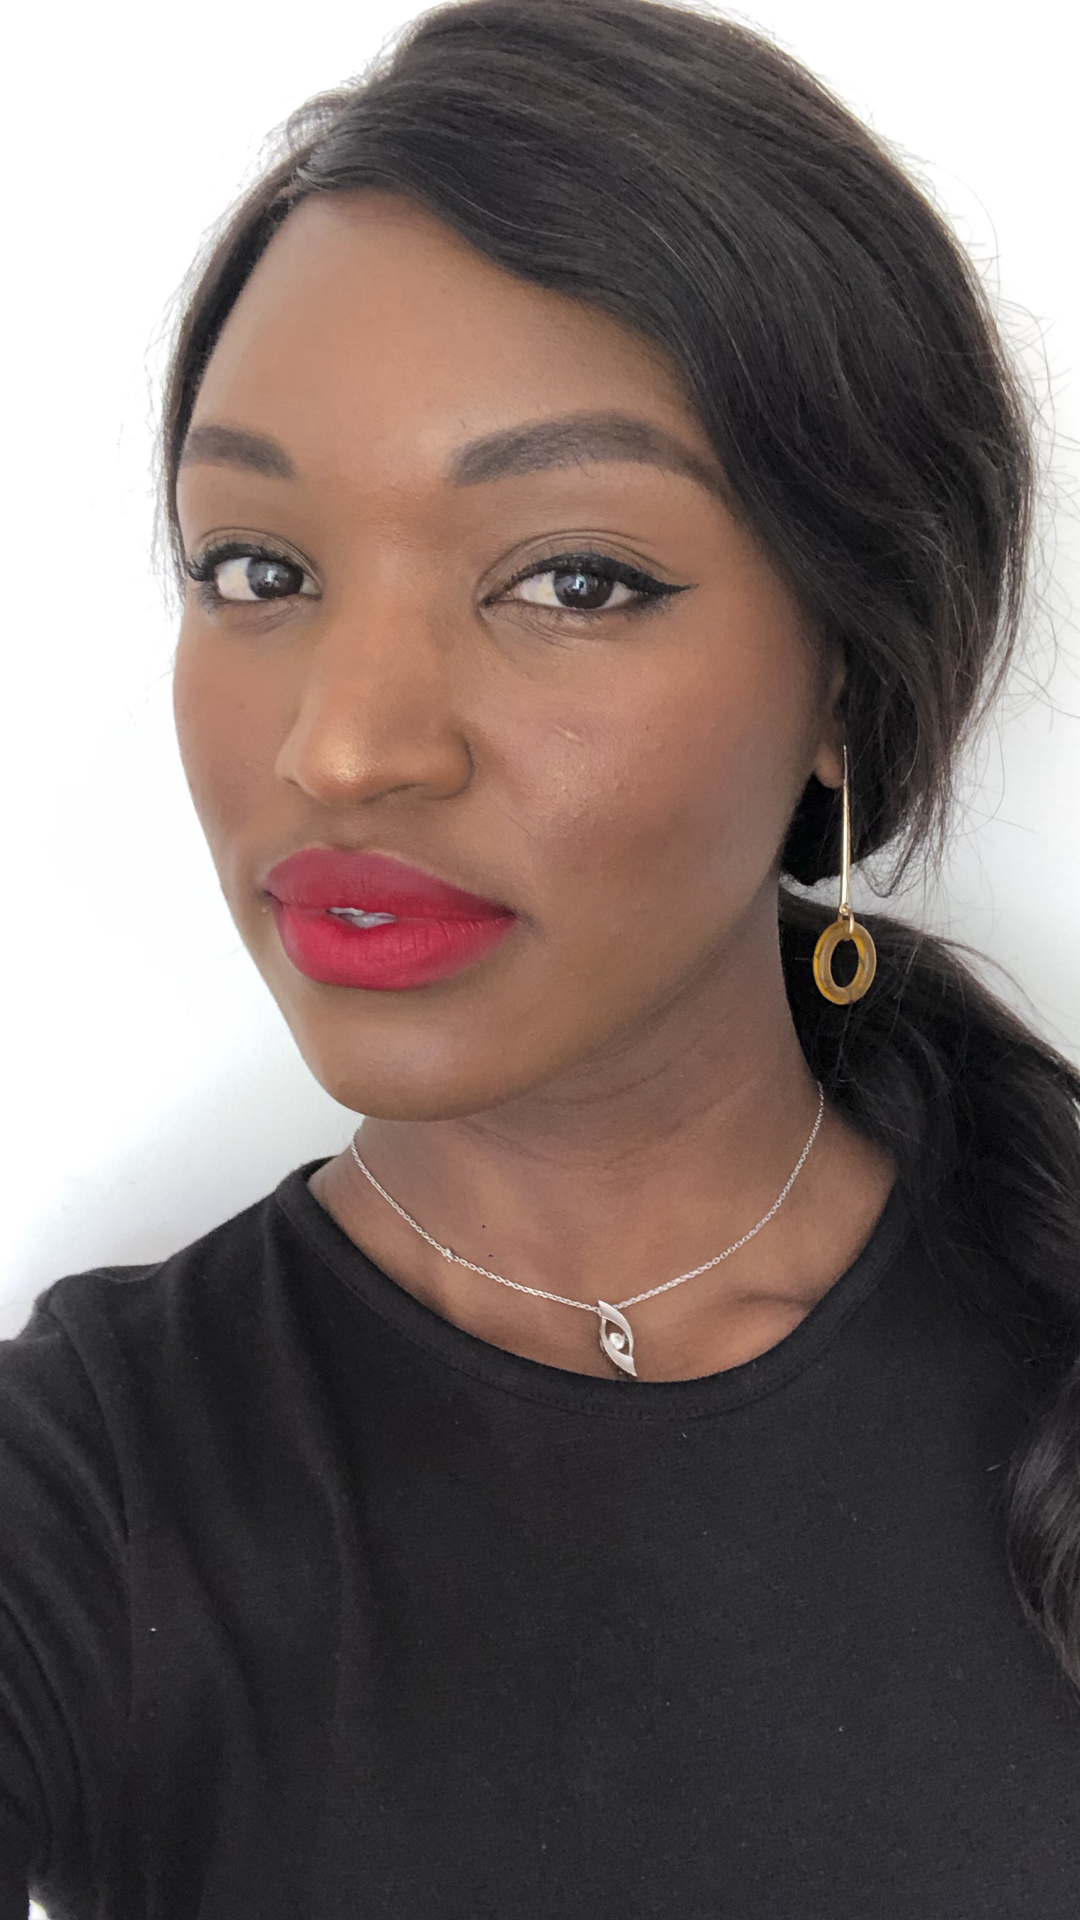 Veronica Masubo